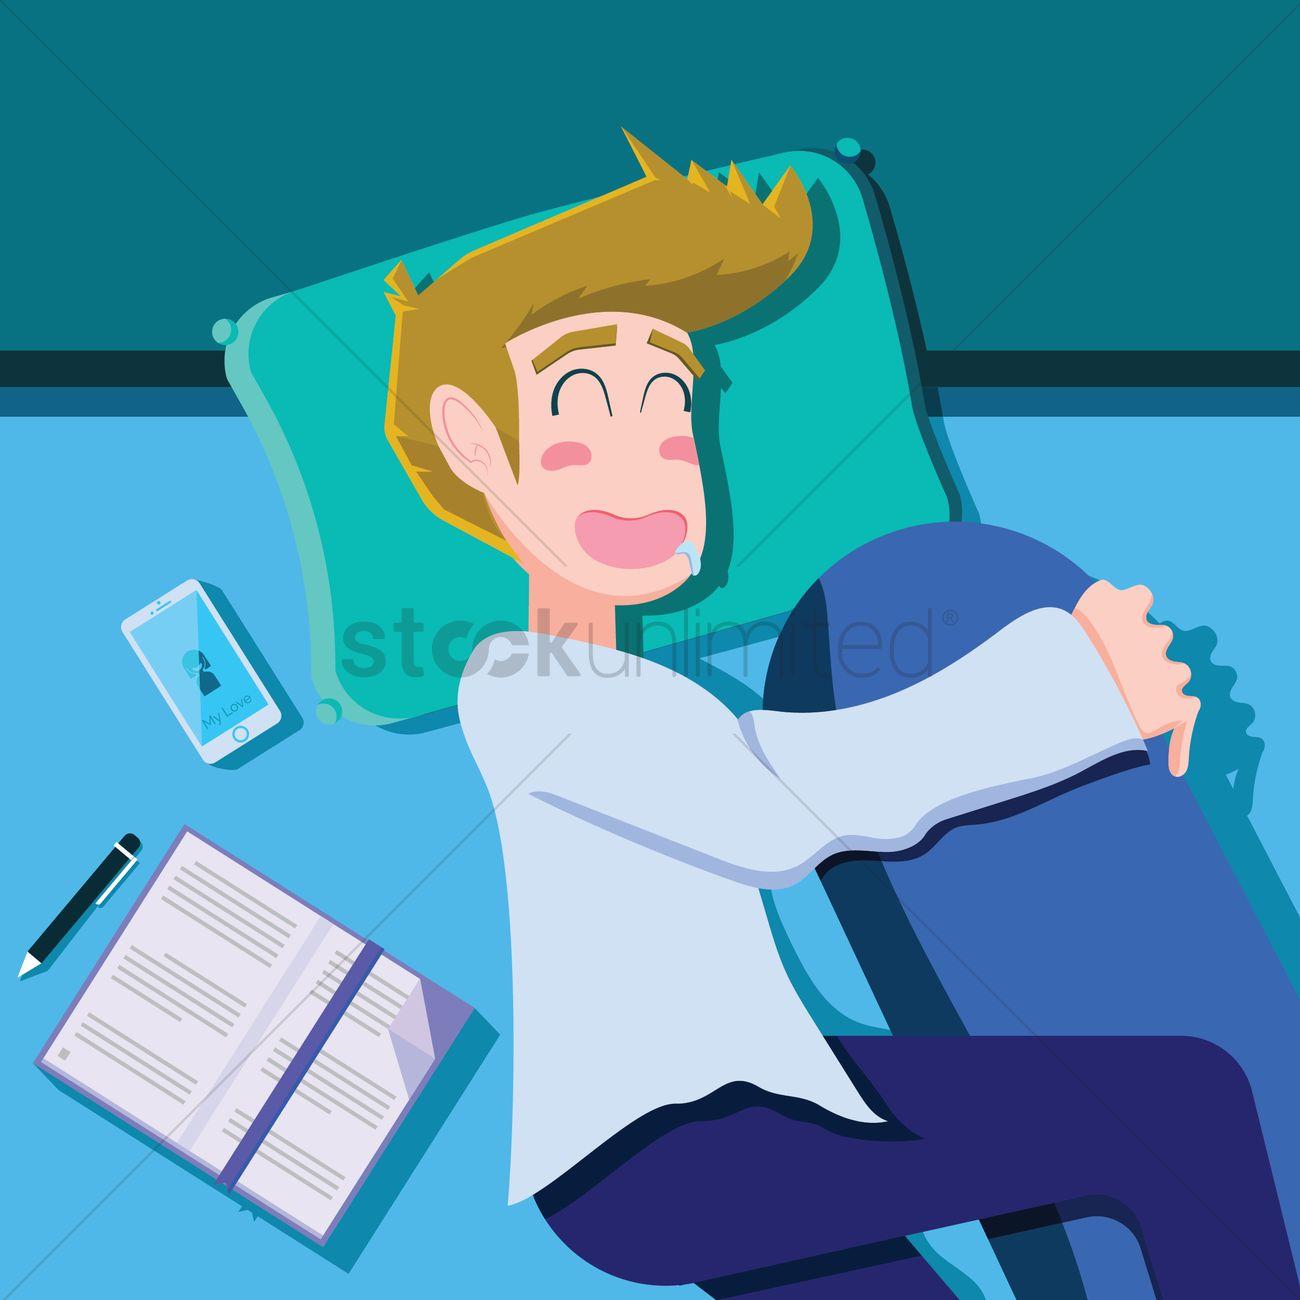 Sleeping boy hugging the pillow Vector Image.